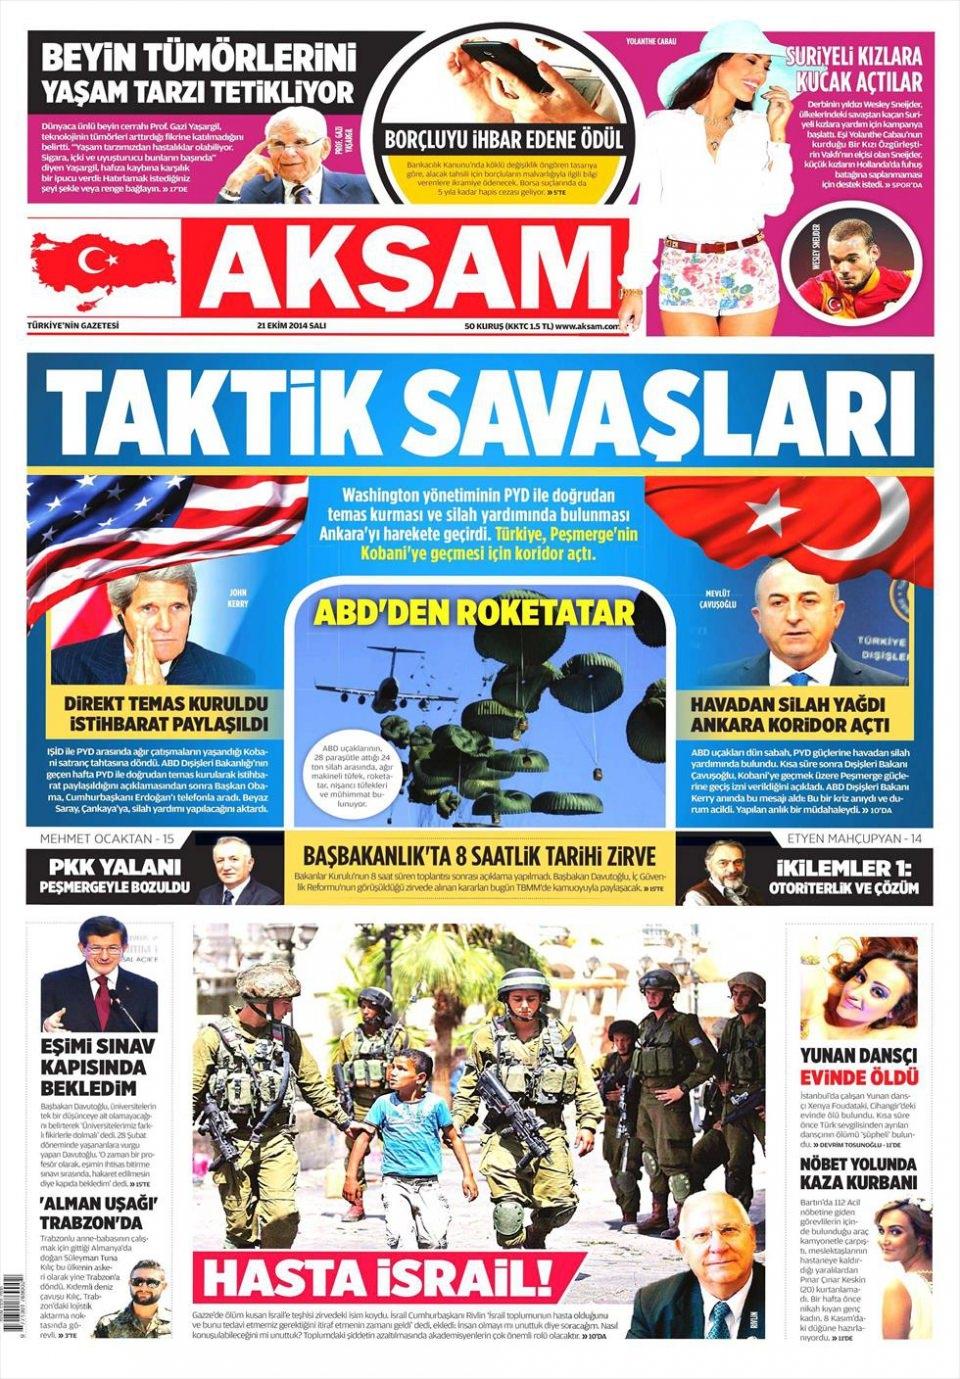 21 Ekim 2014 gazete manşetleri 1